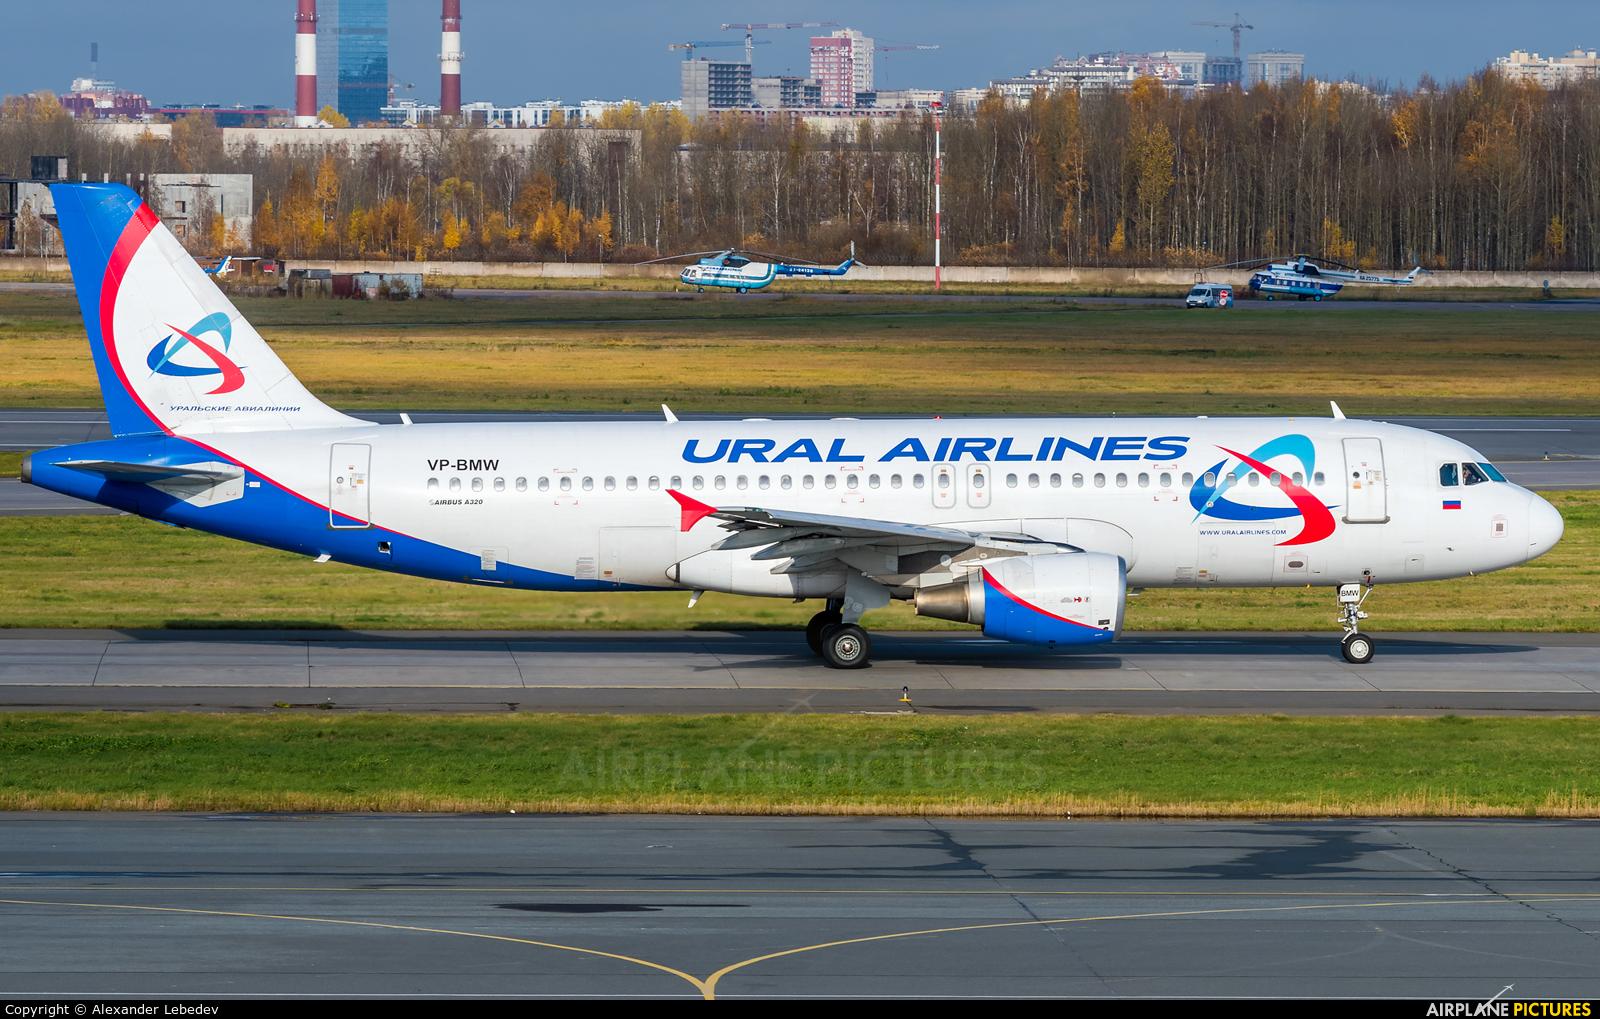 Ural Airlines VP-BMW aircraft at St. Petersburg - Pulkovo